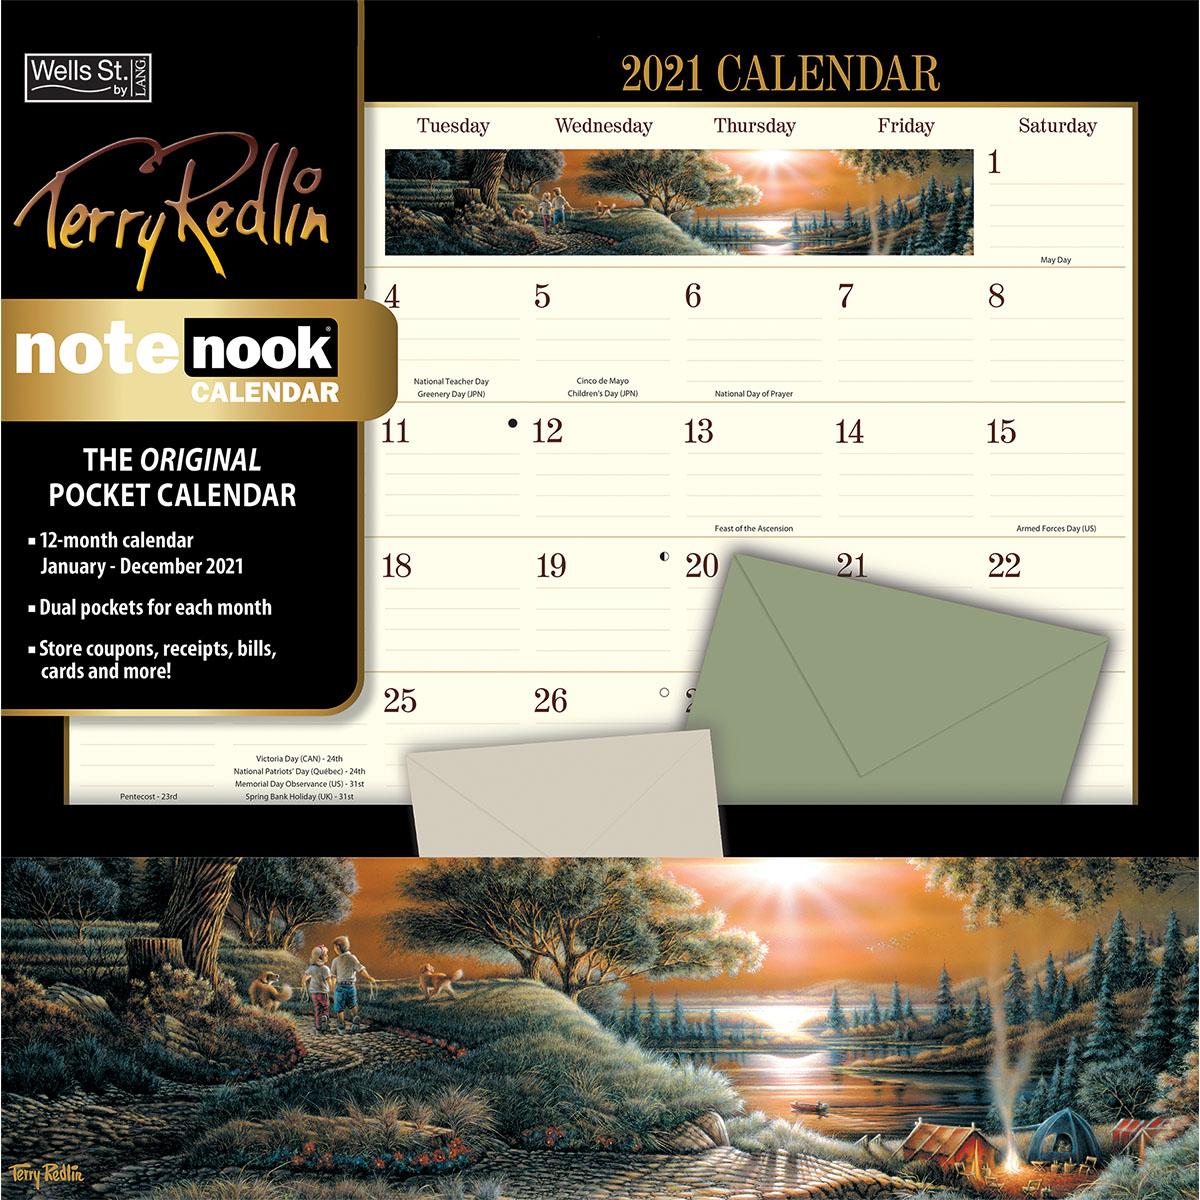 2021 Note Nook Wsbl Calendar regarding Pocket Calendars 2021